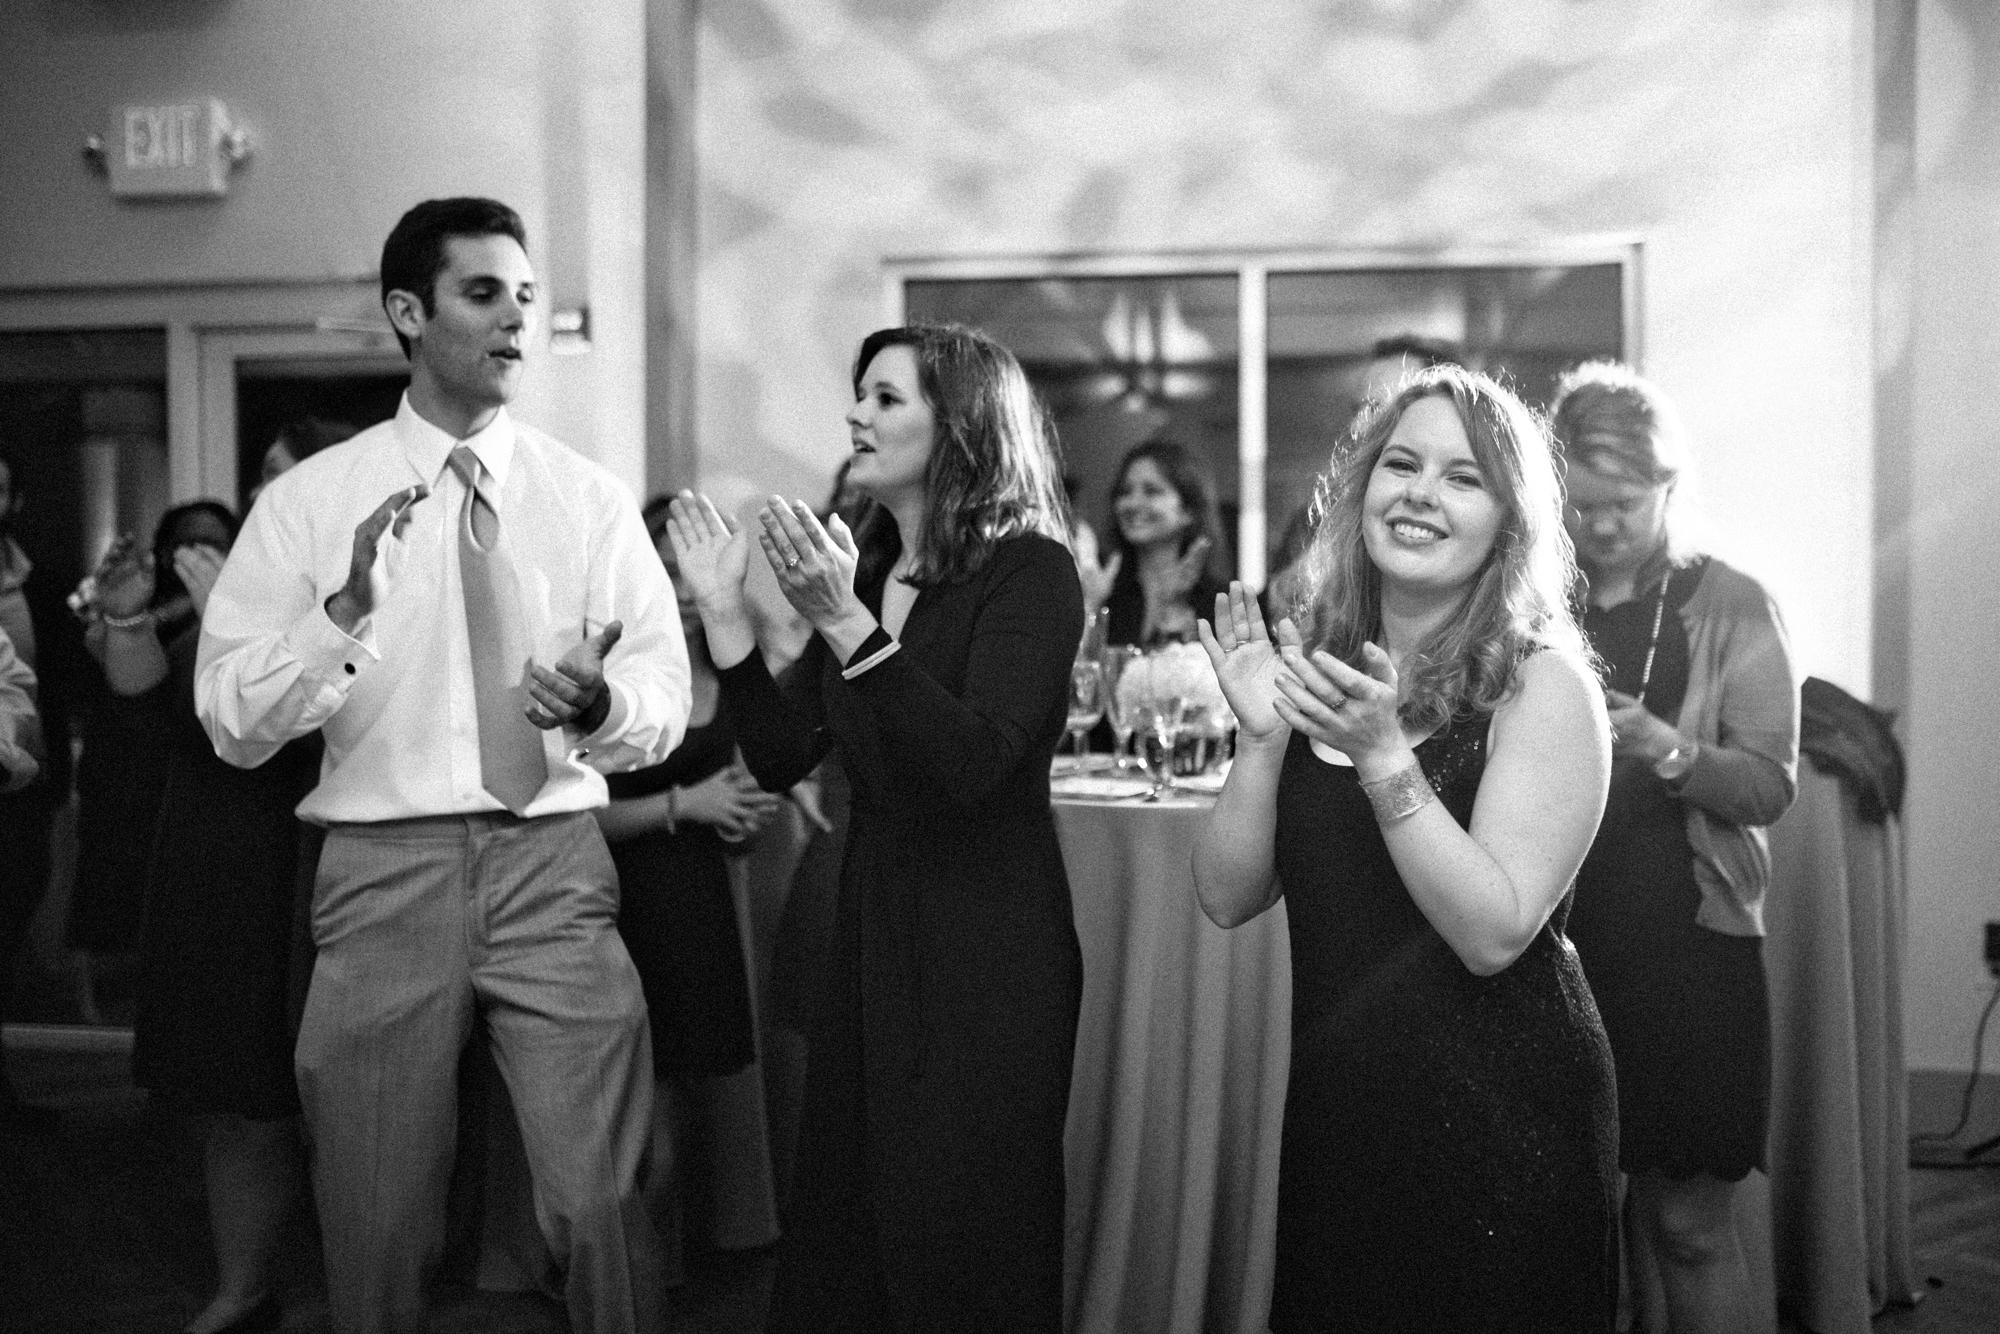 Gulfport_Wedding_Photographer_1258.jpg